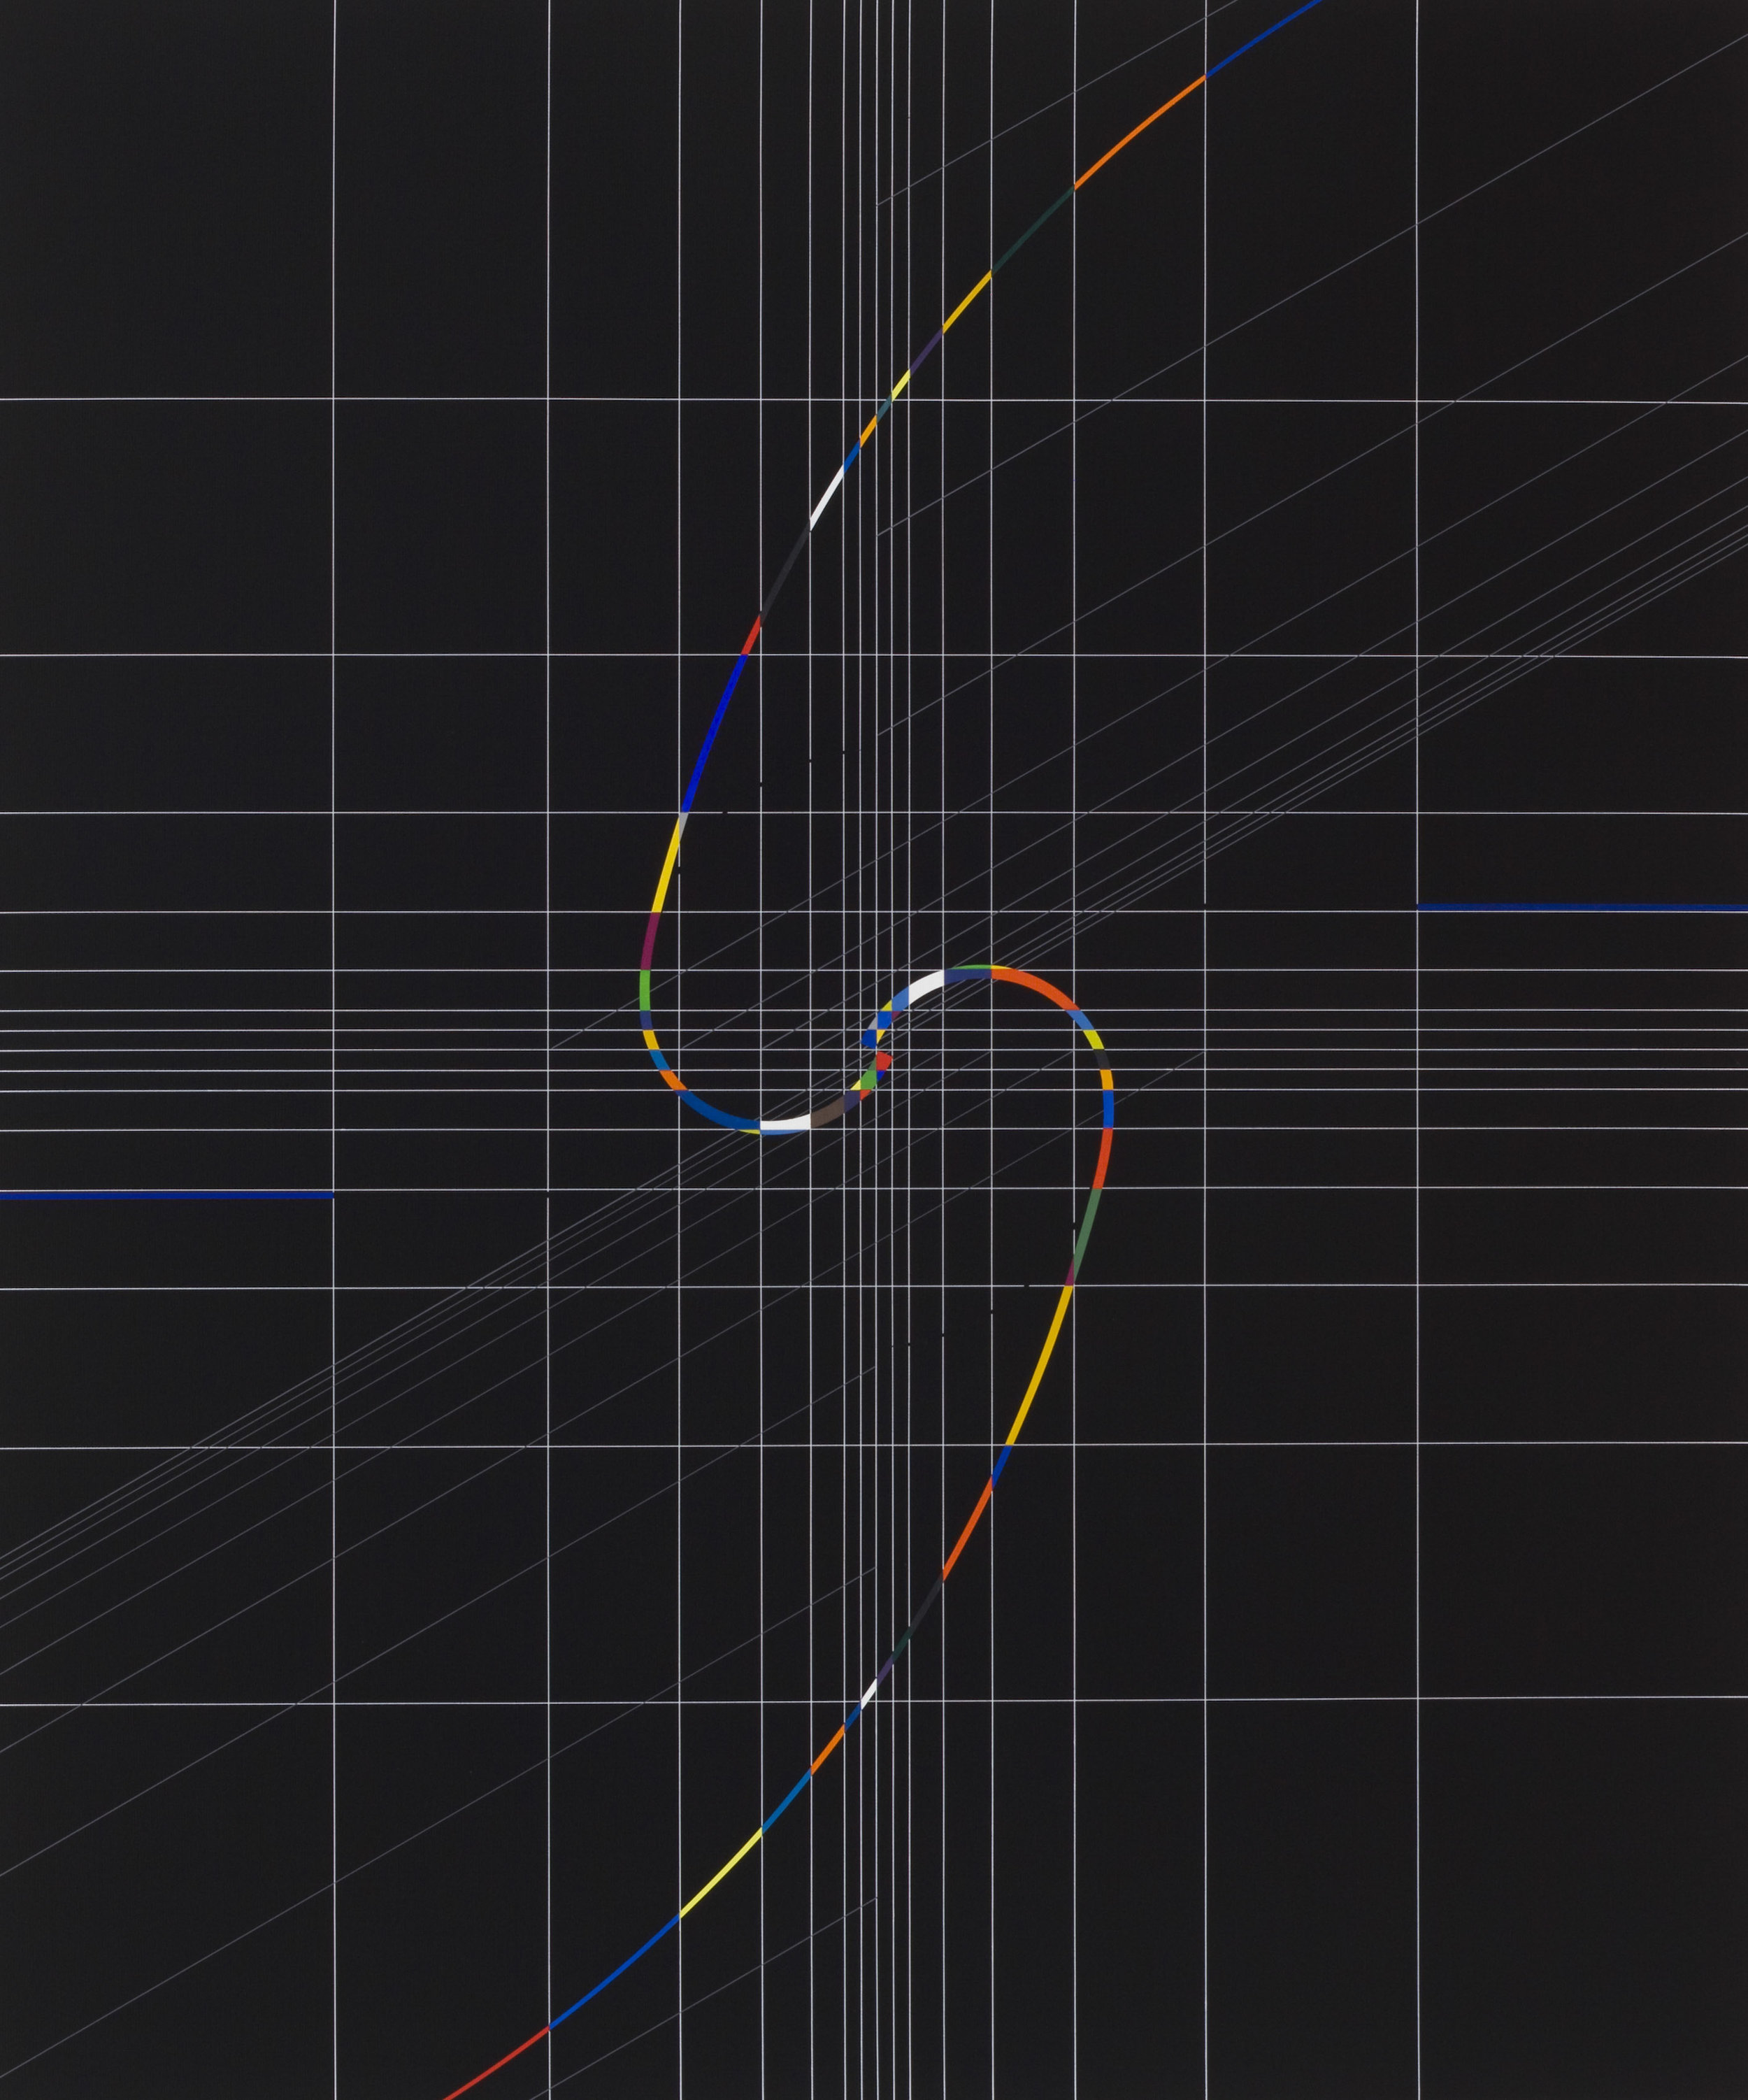 Yantra-ipsum-samsara(1)2012.Dec, acrylic on canvas, 35 7/16 x 29 1/2 in. [90x75cm]